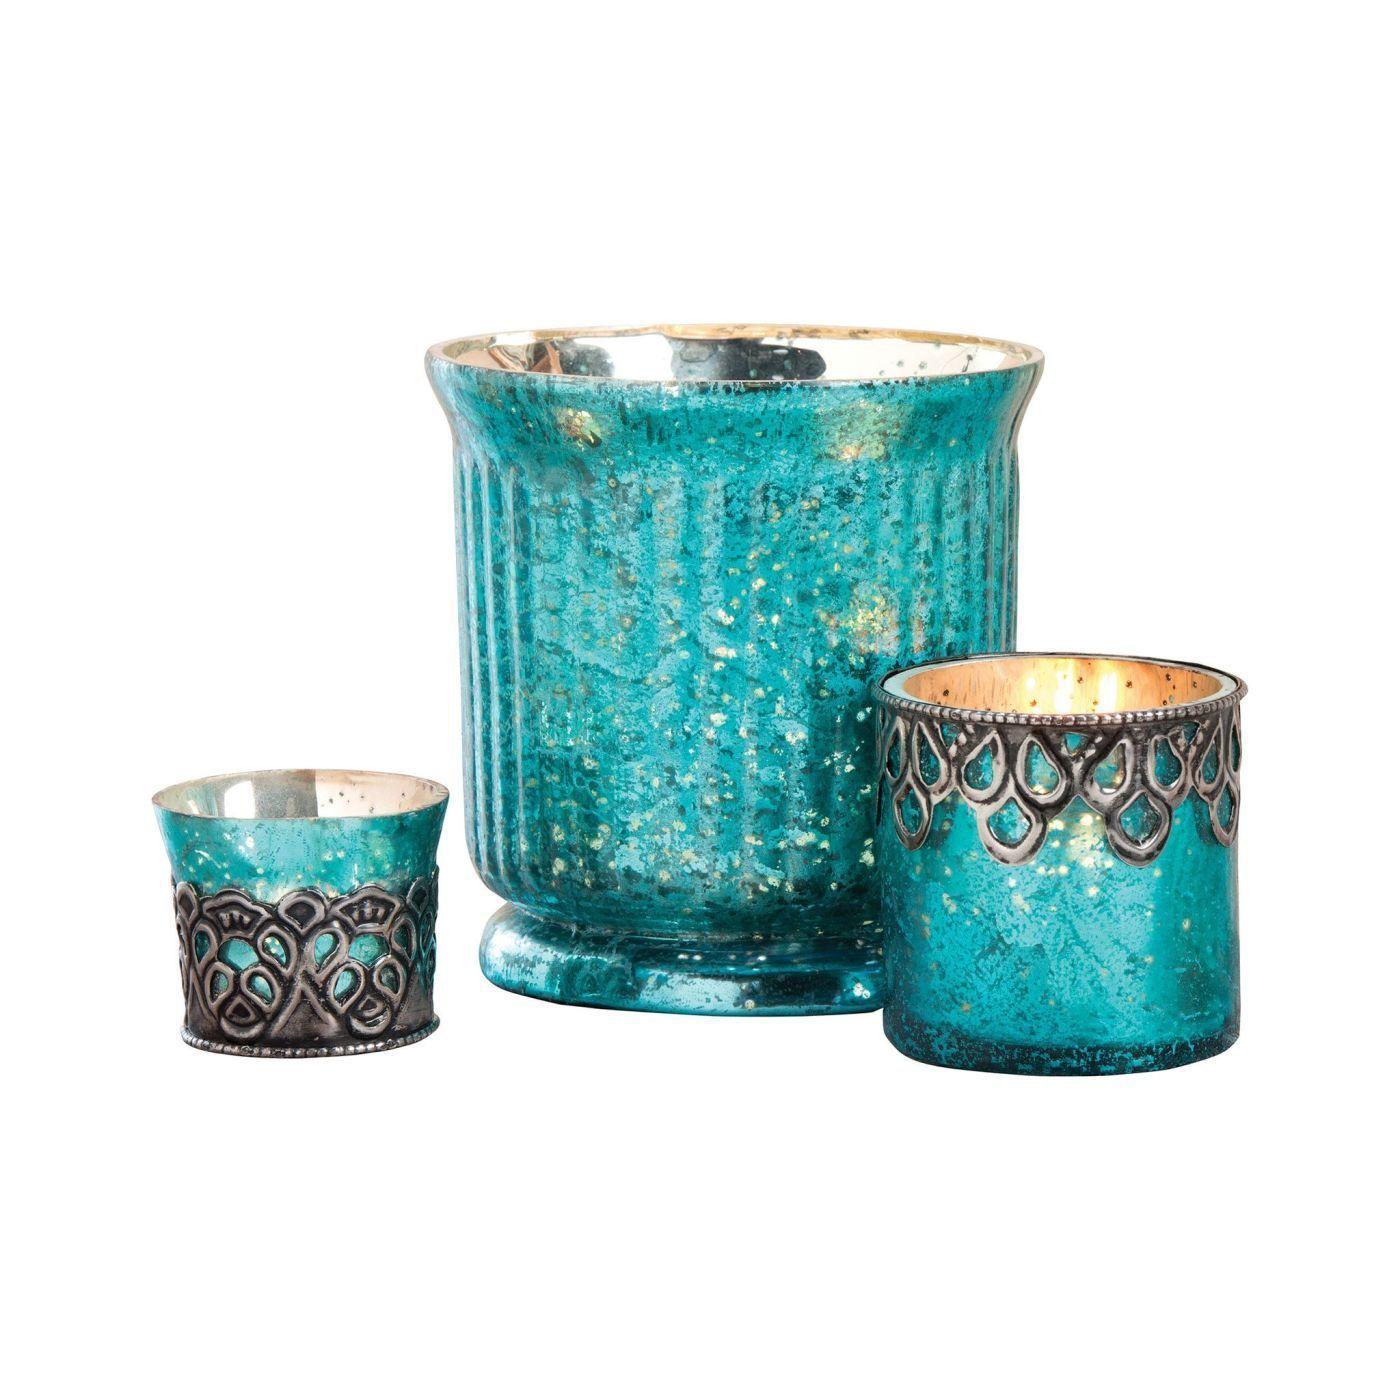 Audrey Set of 3 Votives Antique Turquoise Artifact,Silver